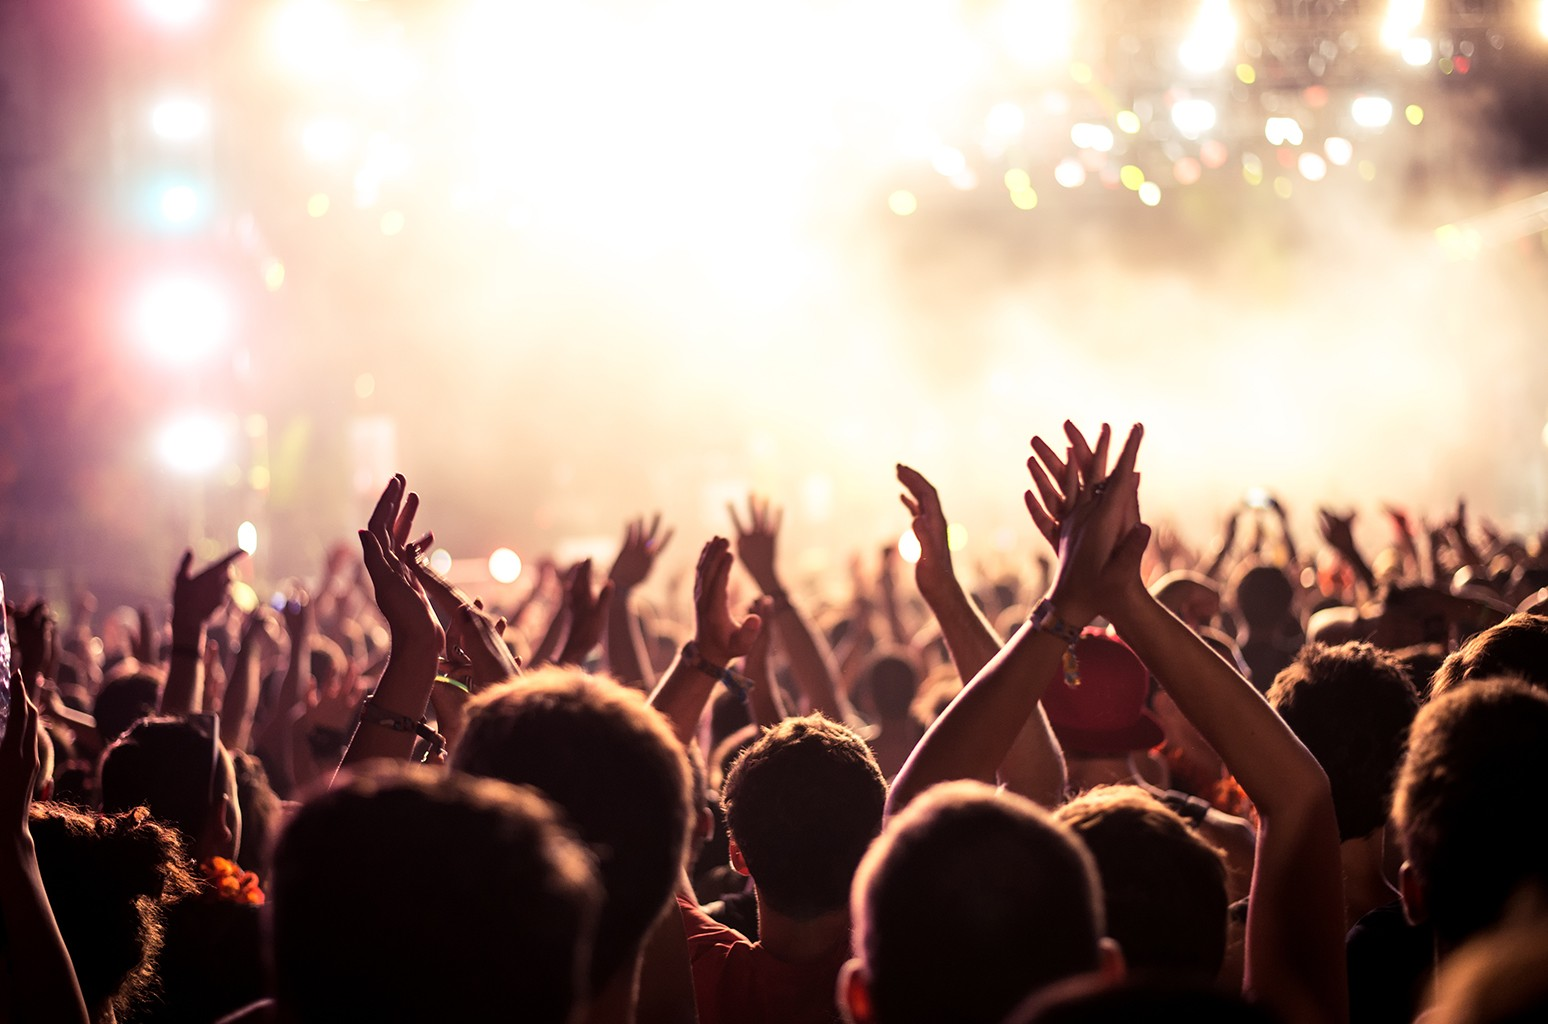 Rave Crowd